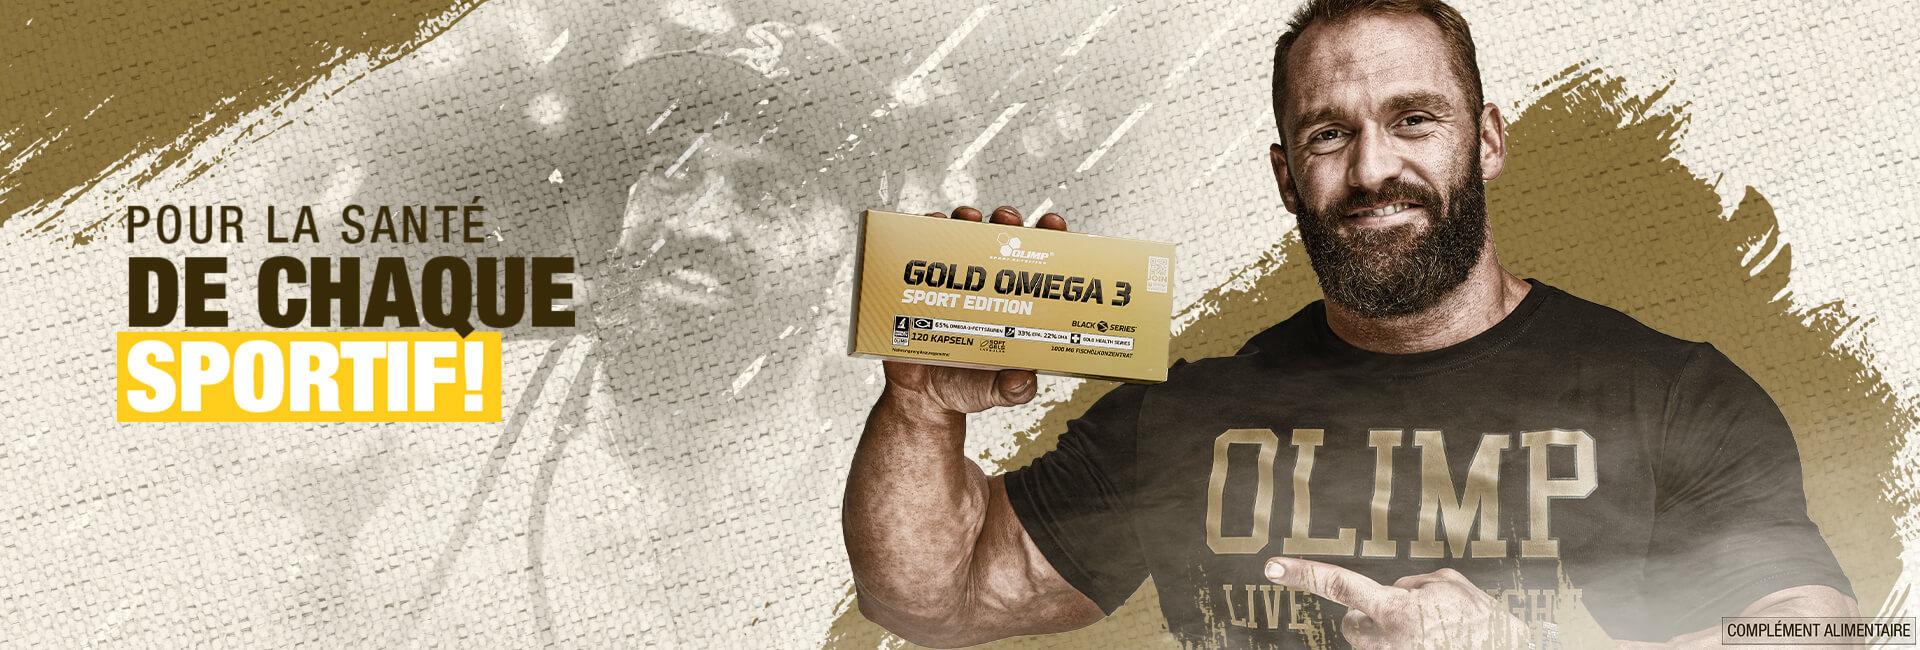 Gold Omega 3 Sport Edition